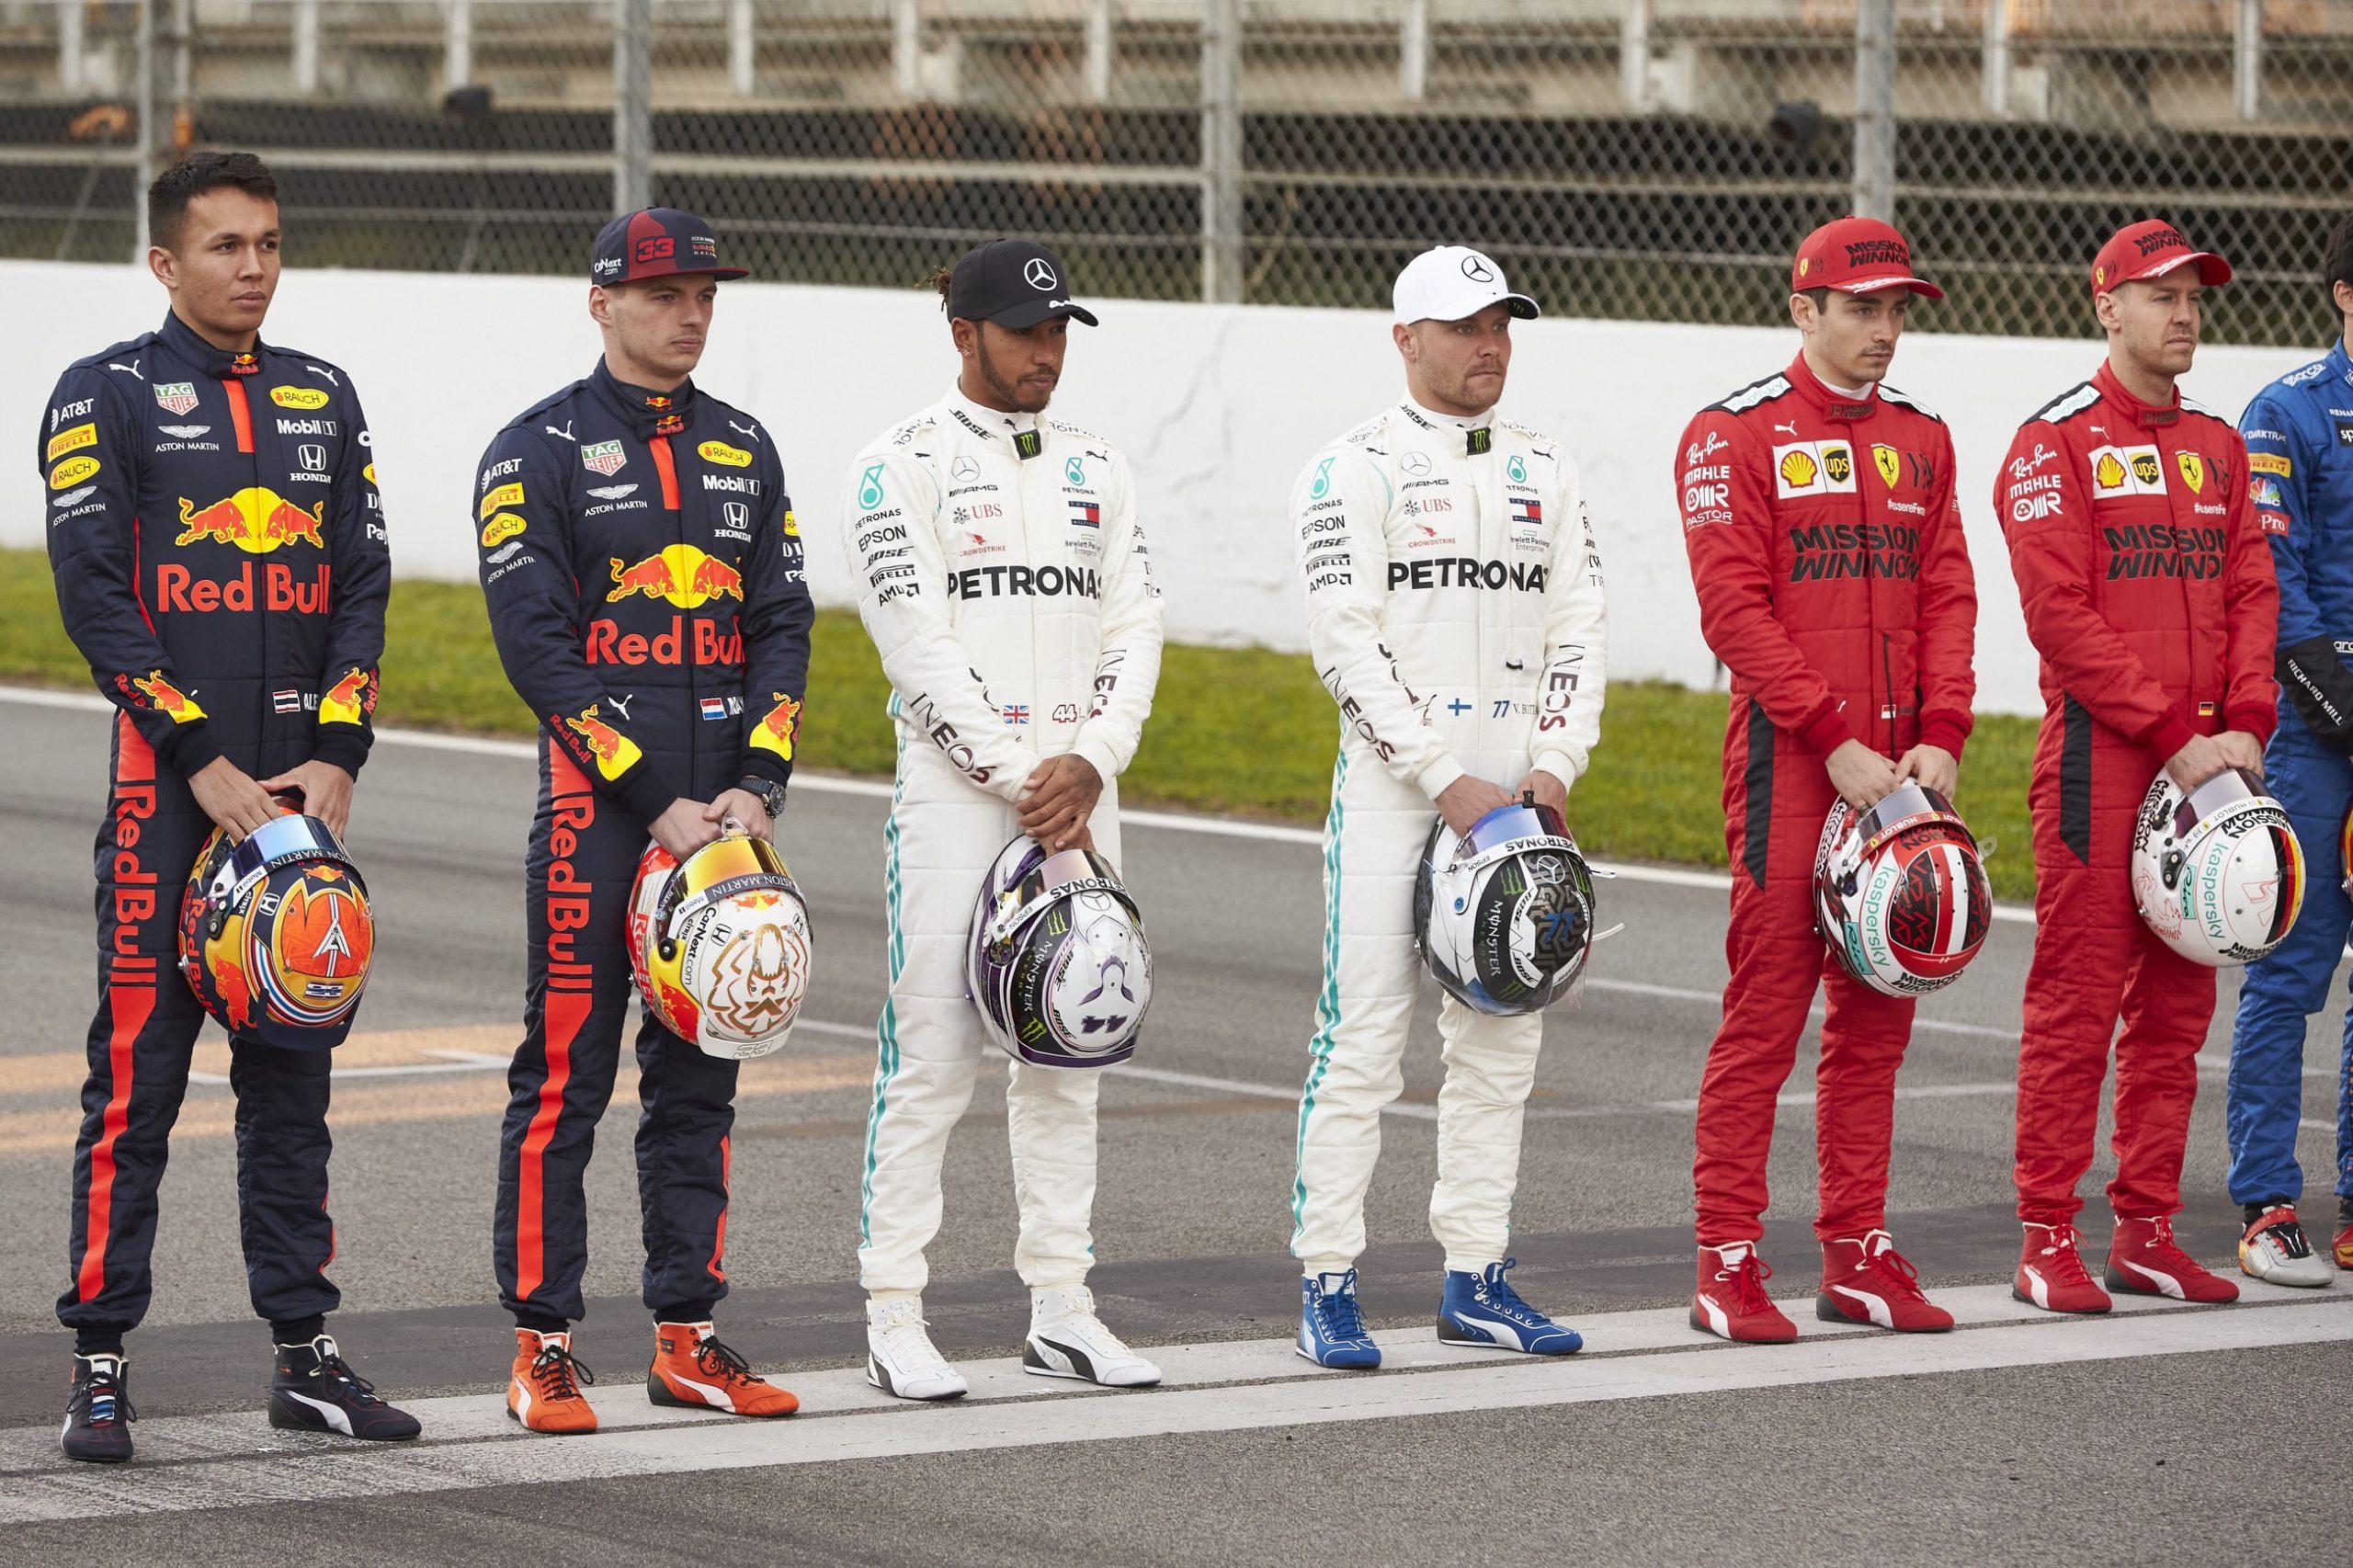 Alexander Albon, Max Verstappen, Lewis Hamilton, Valtteri Bottas, Charles Leclerc, Sebastian Vettel